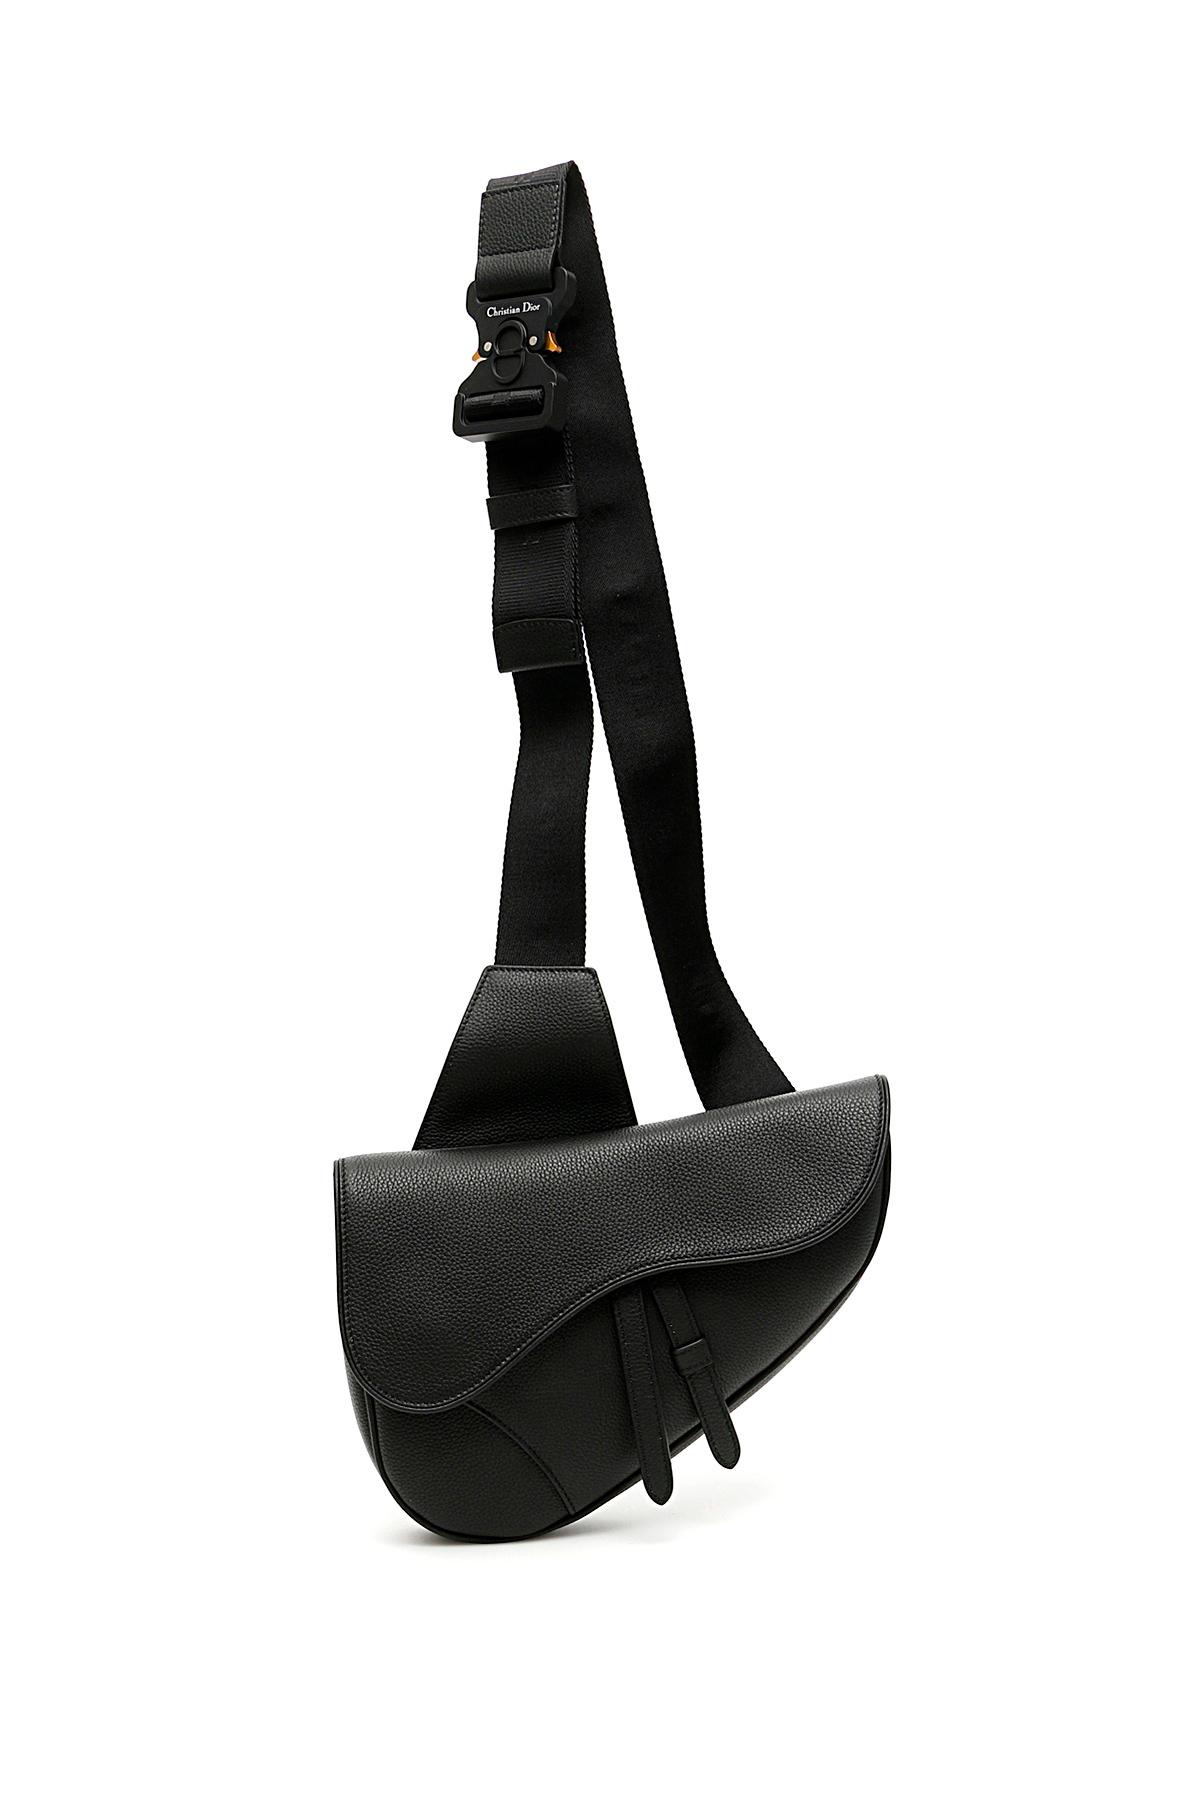 Dior borsa saddle in pelle